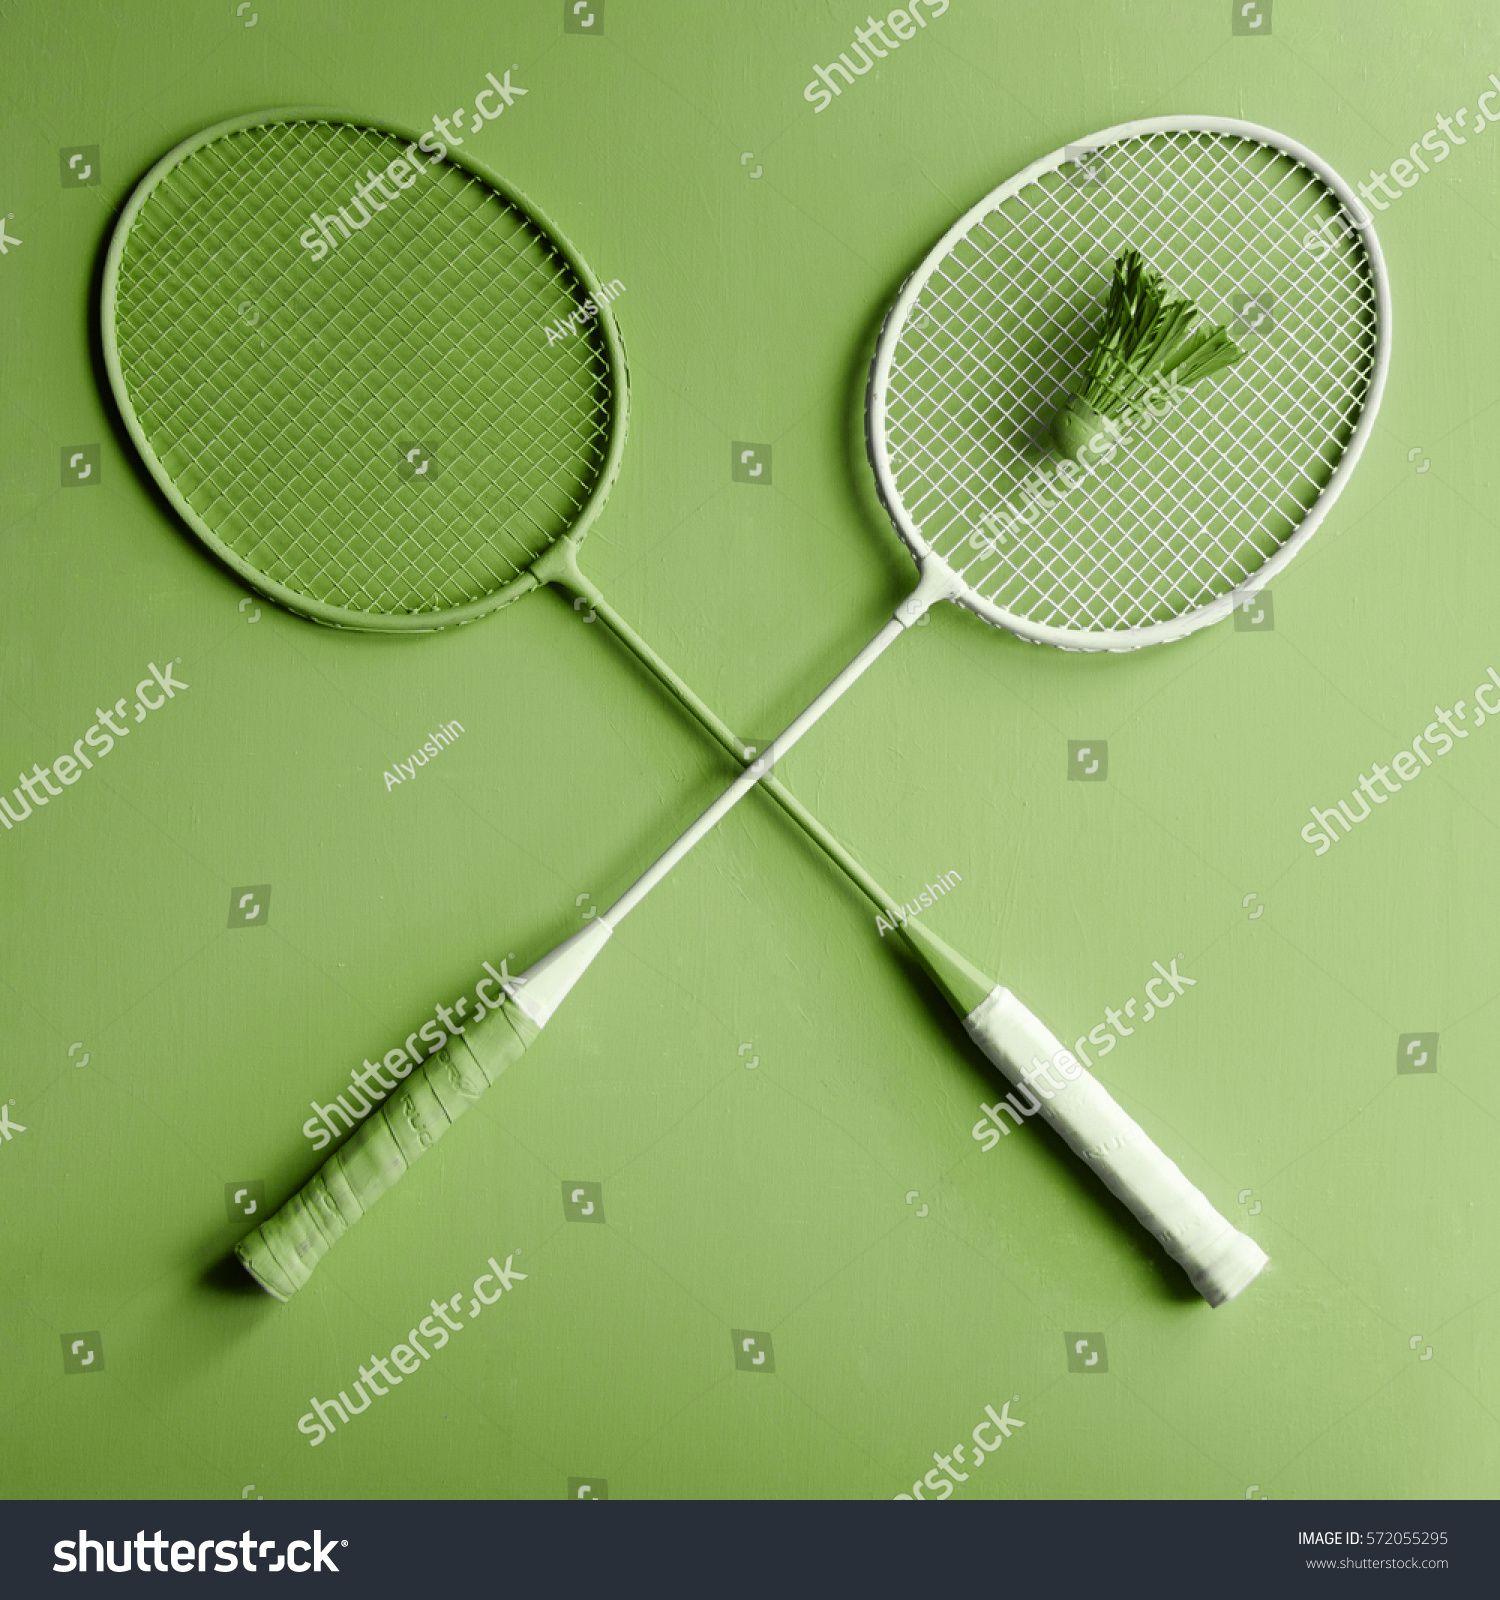 Green Creative Sport Badminton Rackets On Fashion Design Greenery Background Ad Affiliate Sport Badminton Gr Greenery Background Badminton Racket Rackets